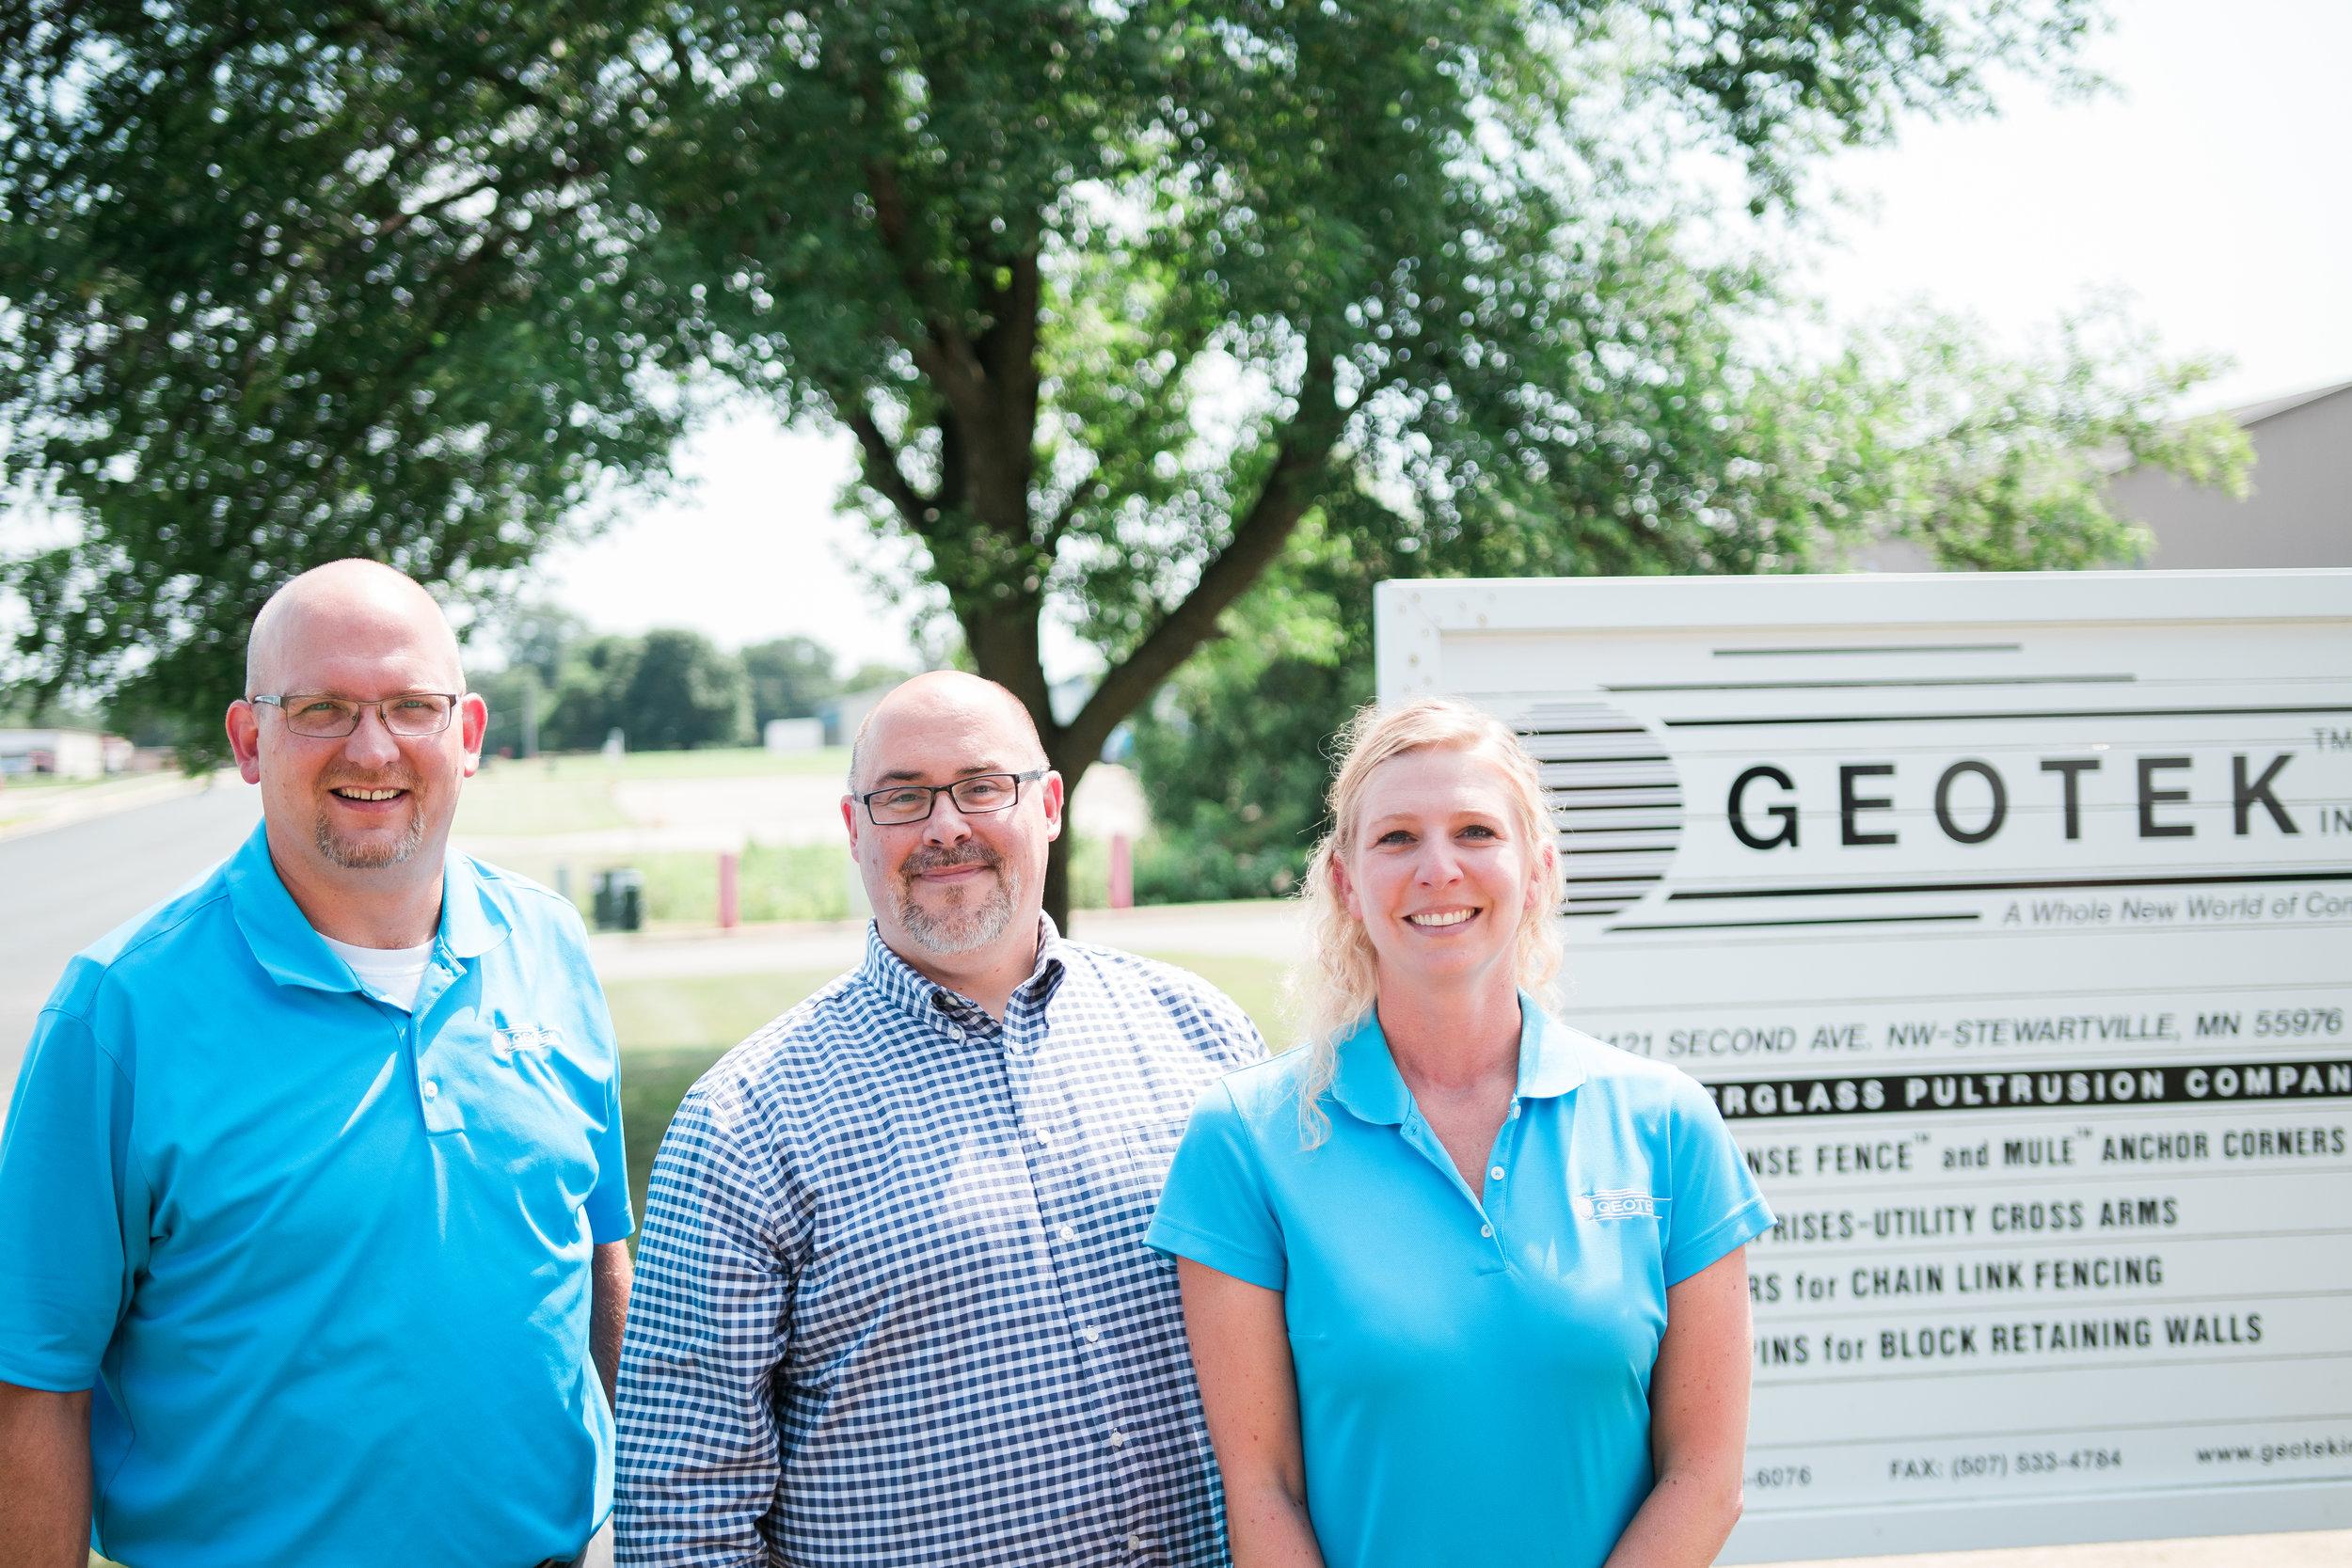 Left to right:Karl Clausen, Wes Duellman and GEOTEK HR Director Mollie Forstner